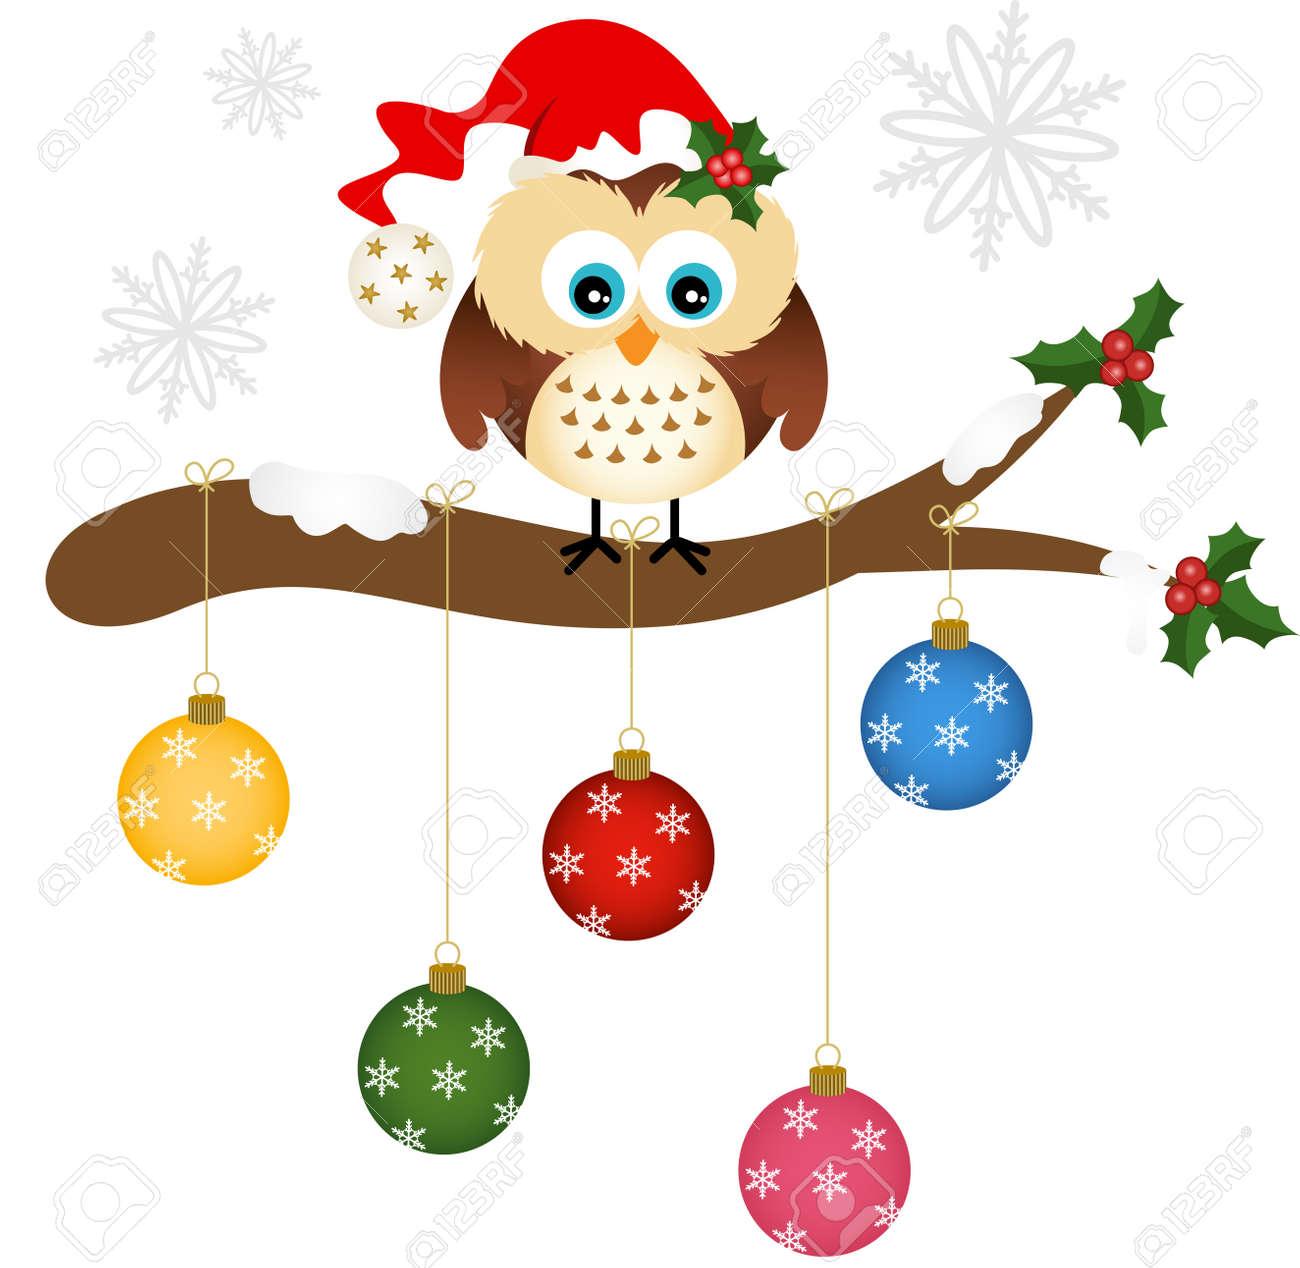 Christmas Owl.Christmas Owl On Holly Branch With Glass Balls